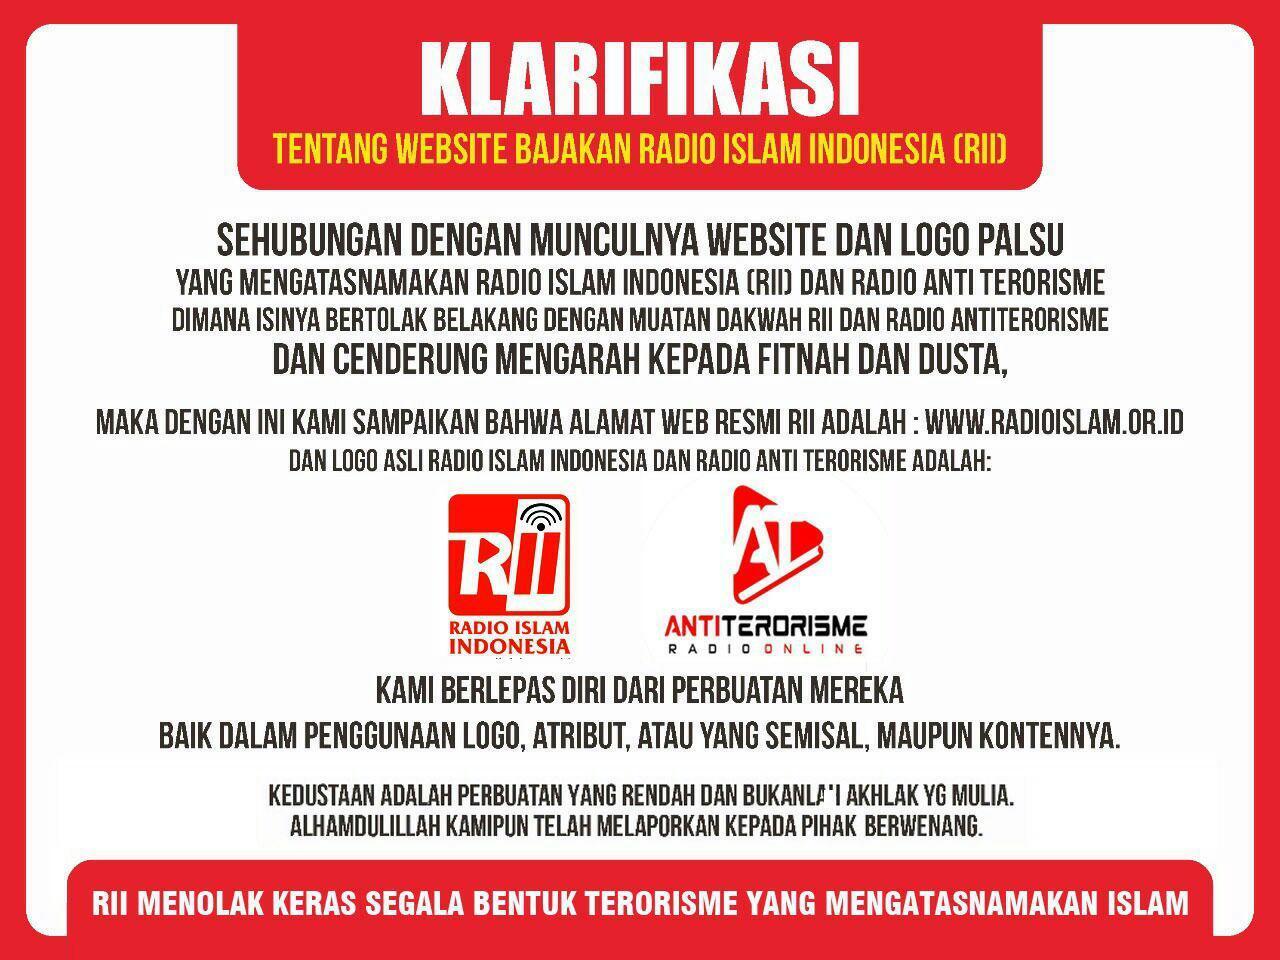 Klarifikasi Website Bajakan Radio Islam Indonesia (RII) Anti Terorisme